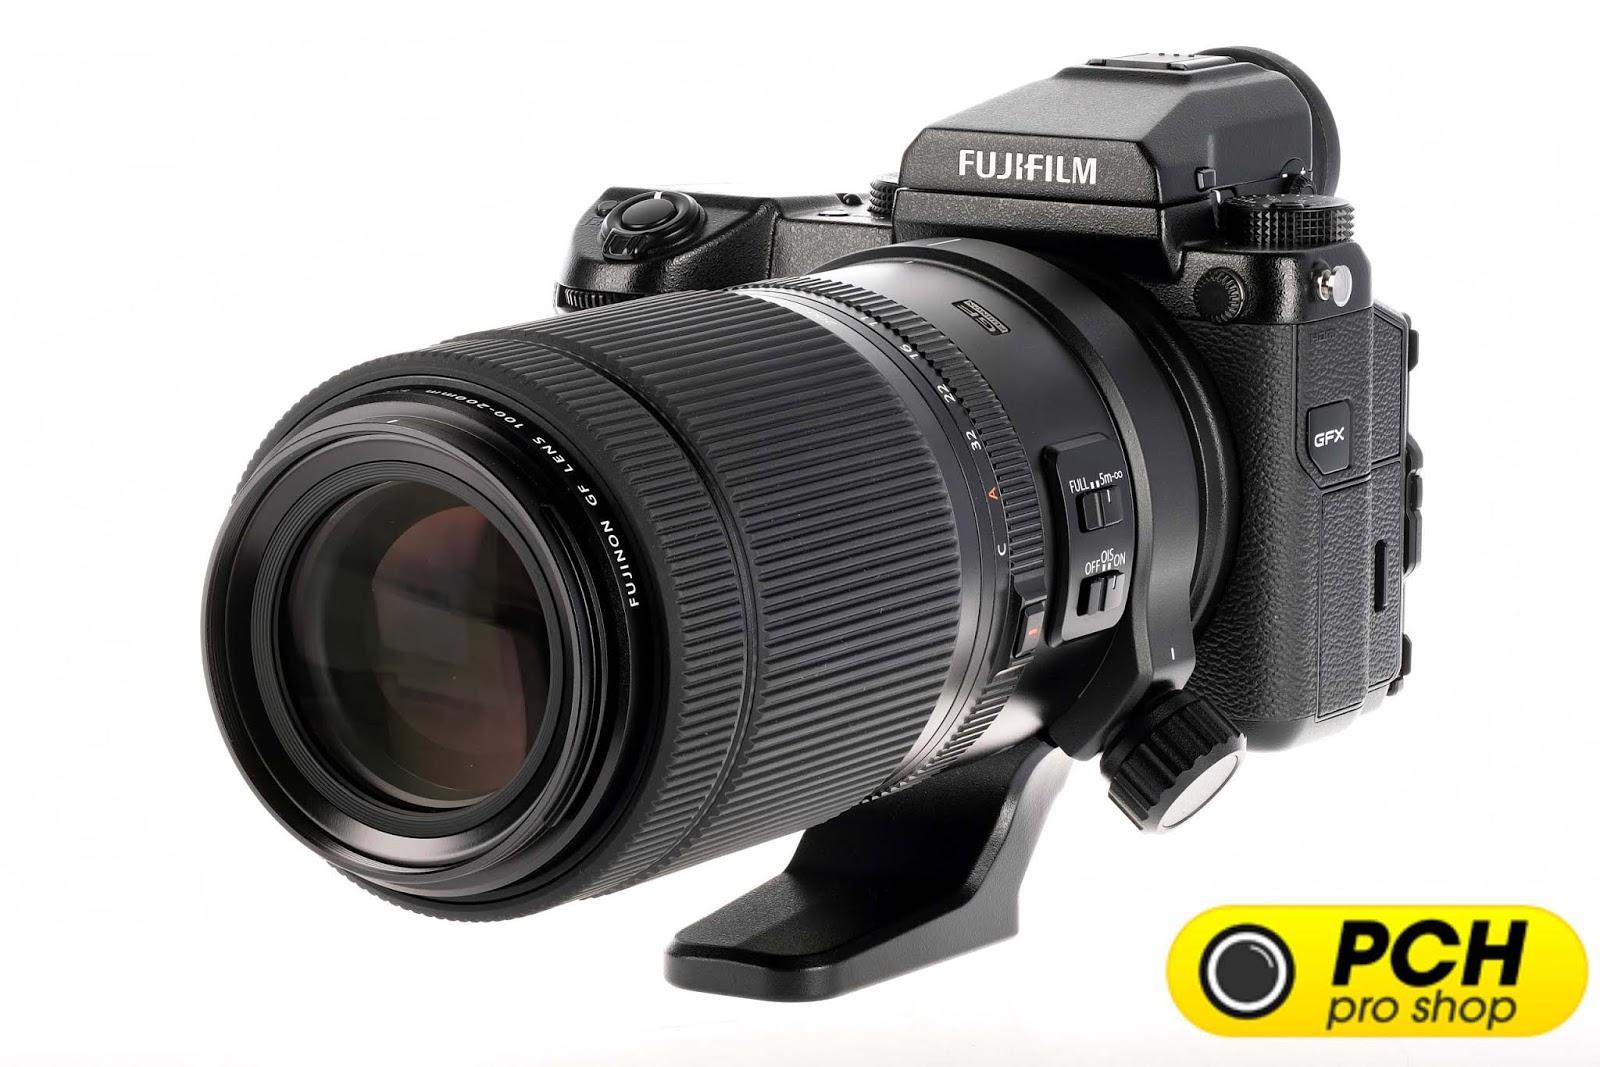 Объектив Fujinon GF 100-200mm f/5.6 R LM OIS WR с камерой Fujifilm GFX 50S